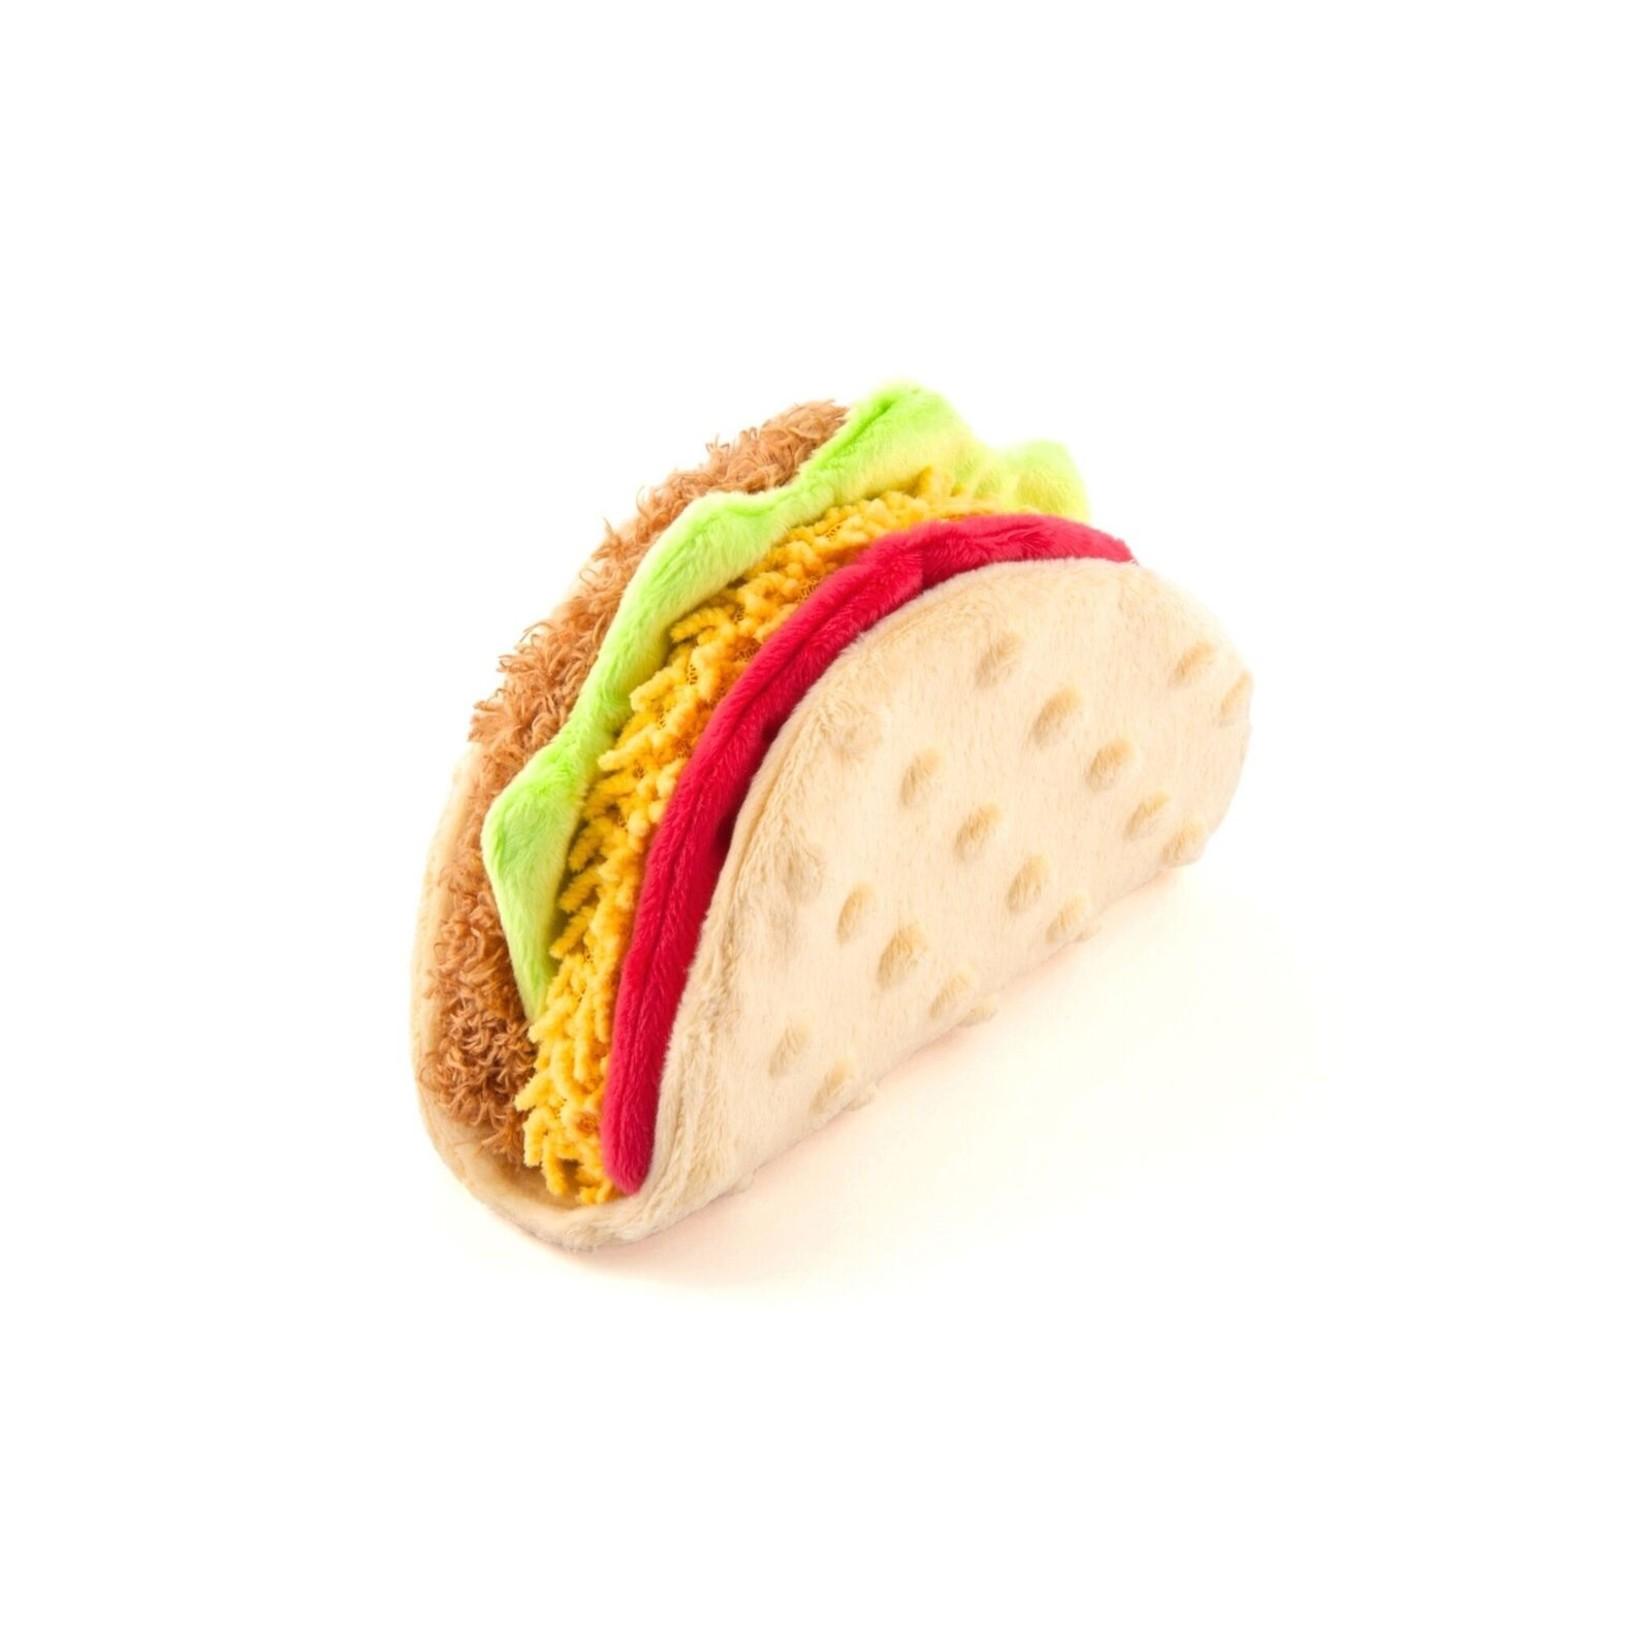 PLAY PLAY Classic Taco